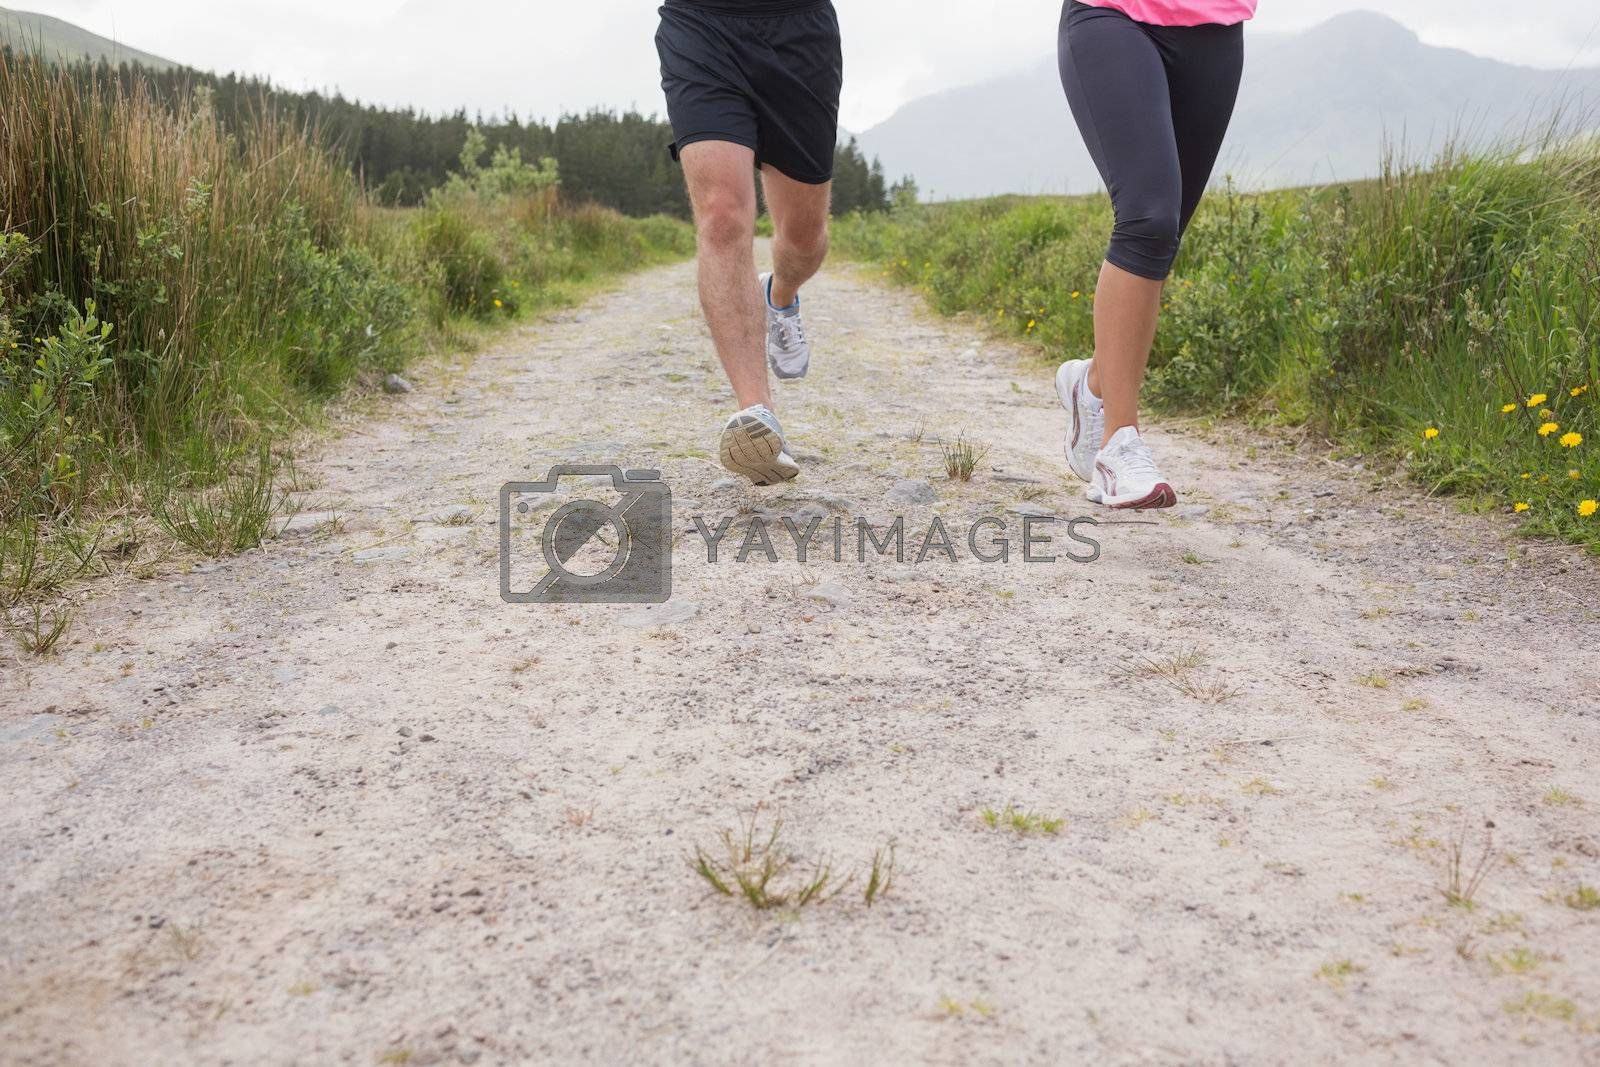 Couples feet running on trail by Wavebreakmedia